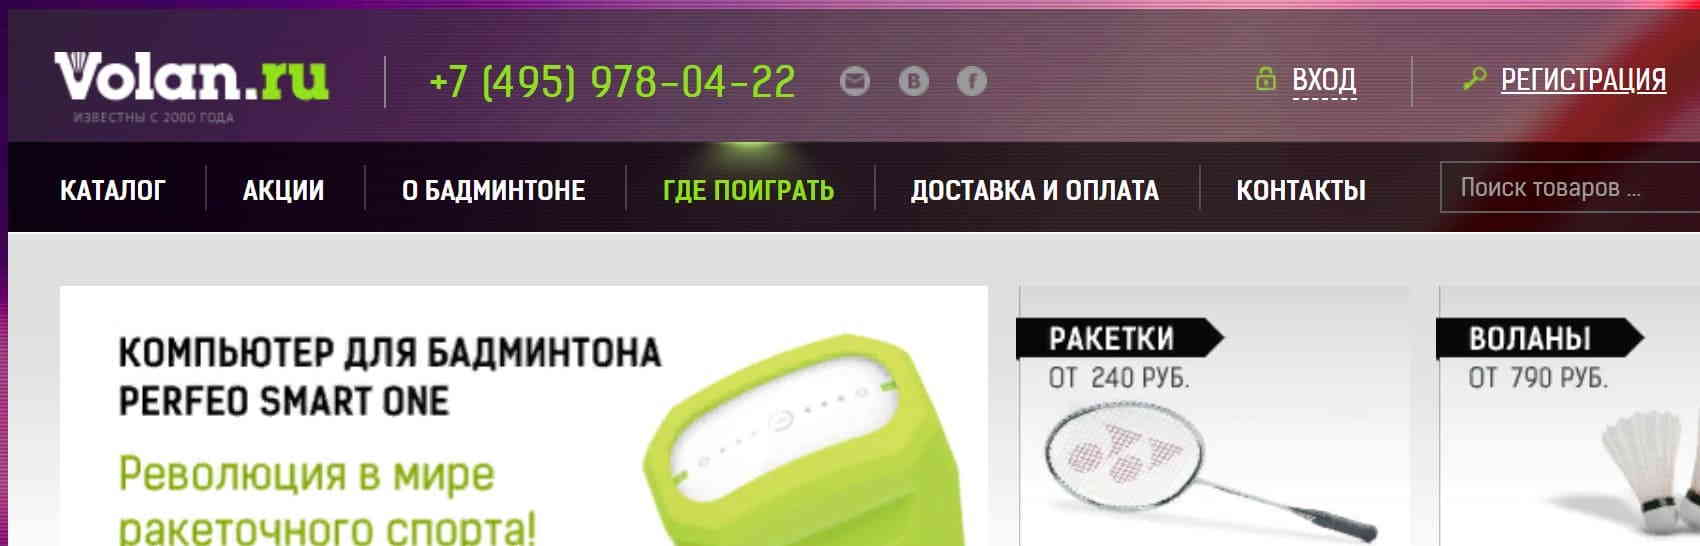 Volan.ru сайт